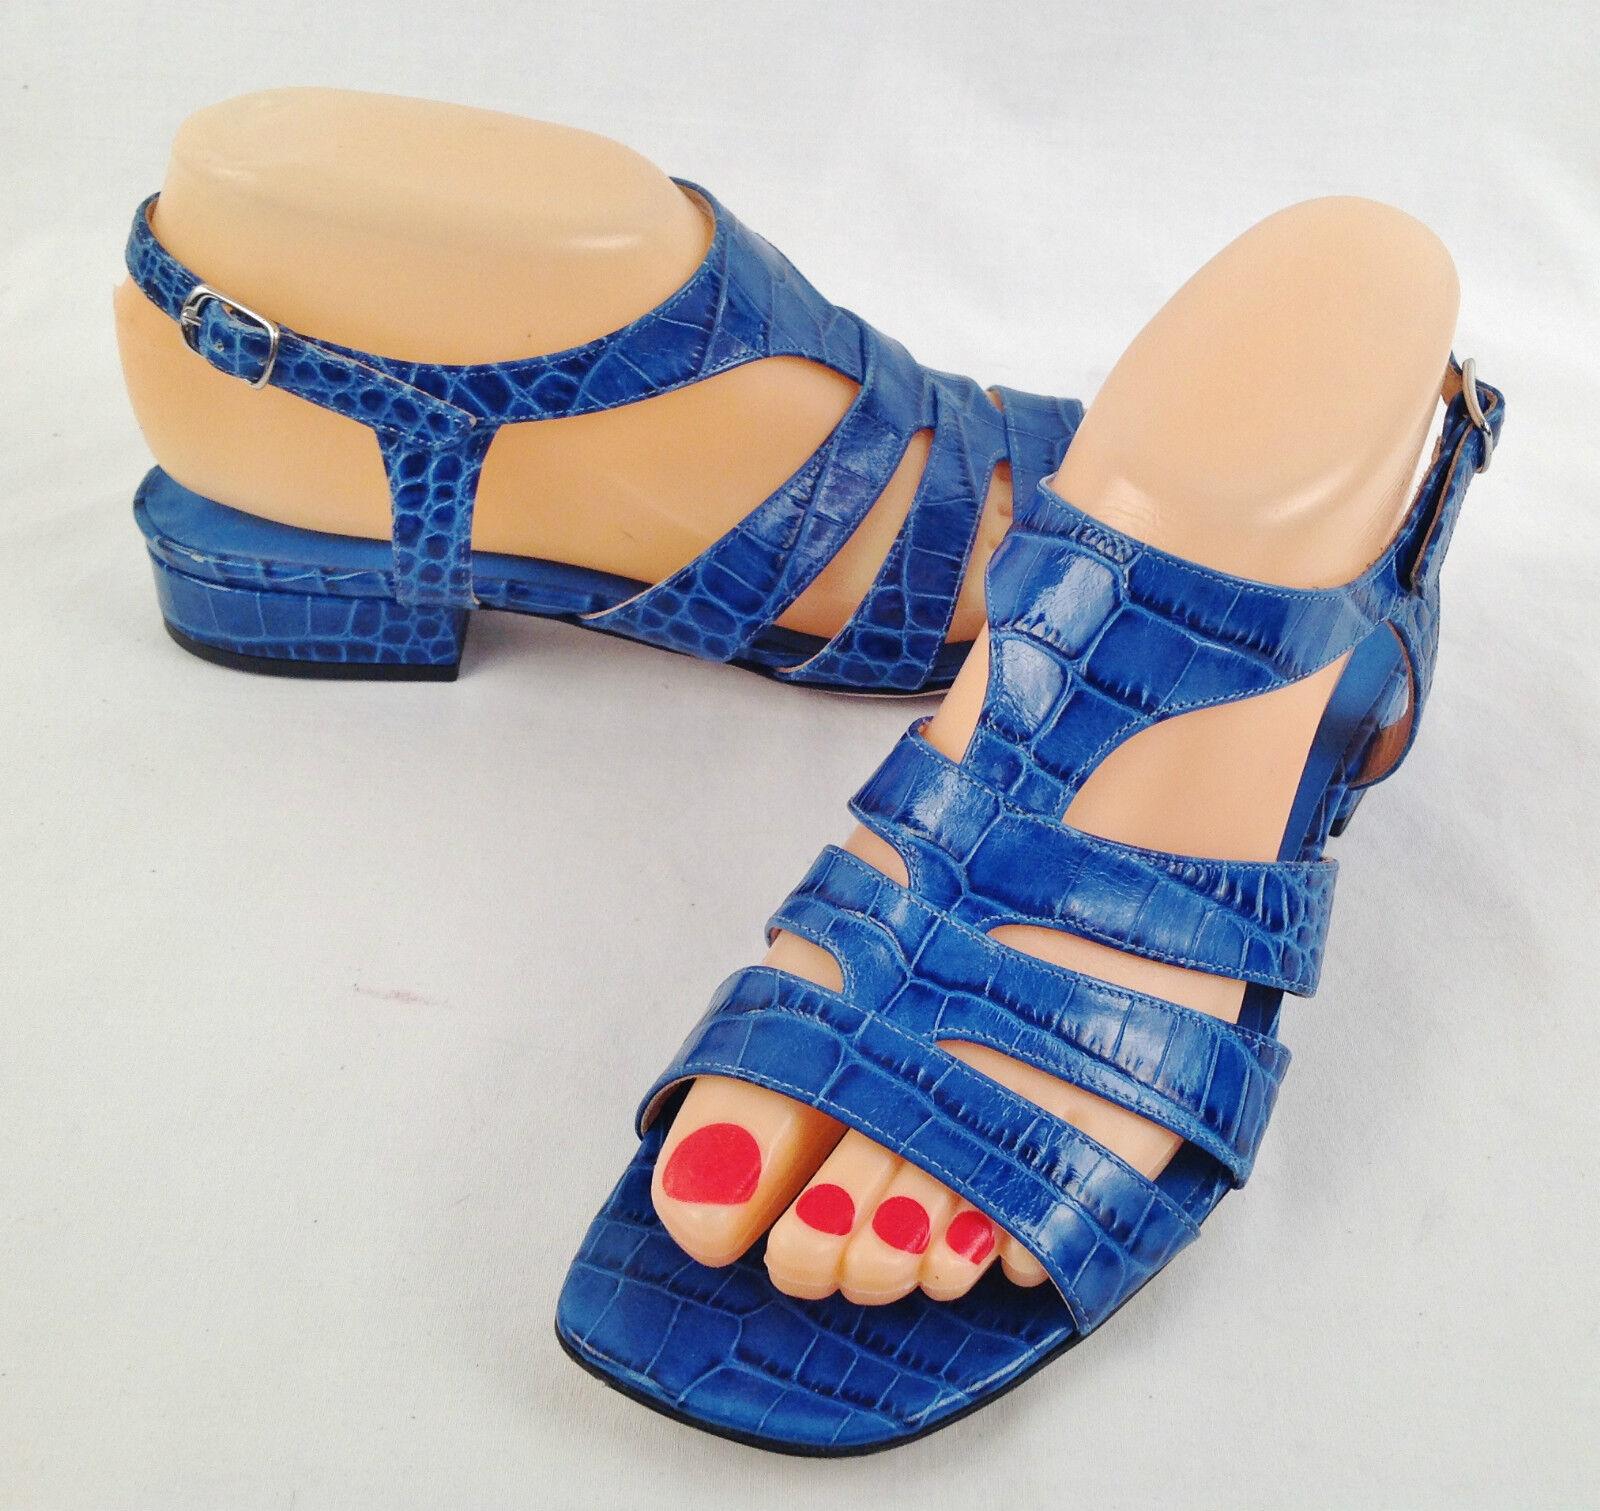 NEW!! Dries Van Norten Sandals- Blue- Size US 7.5/ Eu 37.5 $ 645- (P60)